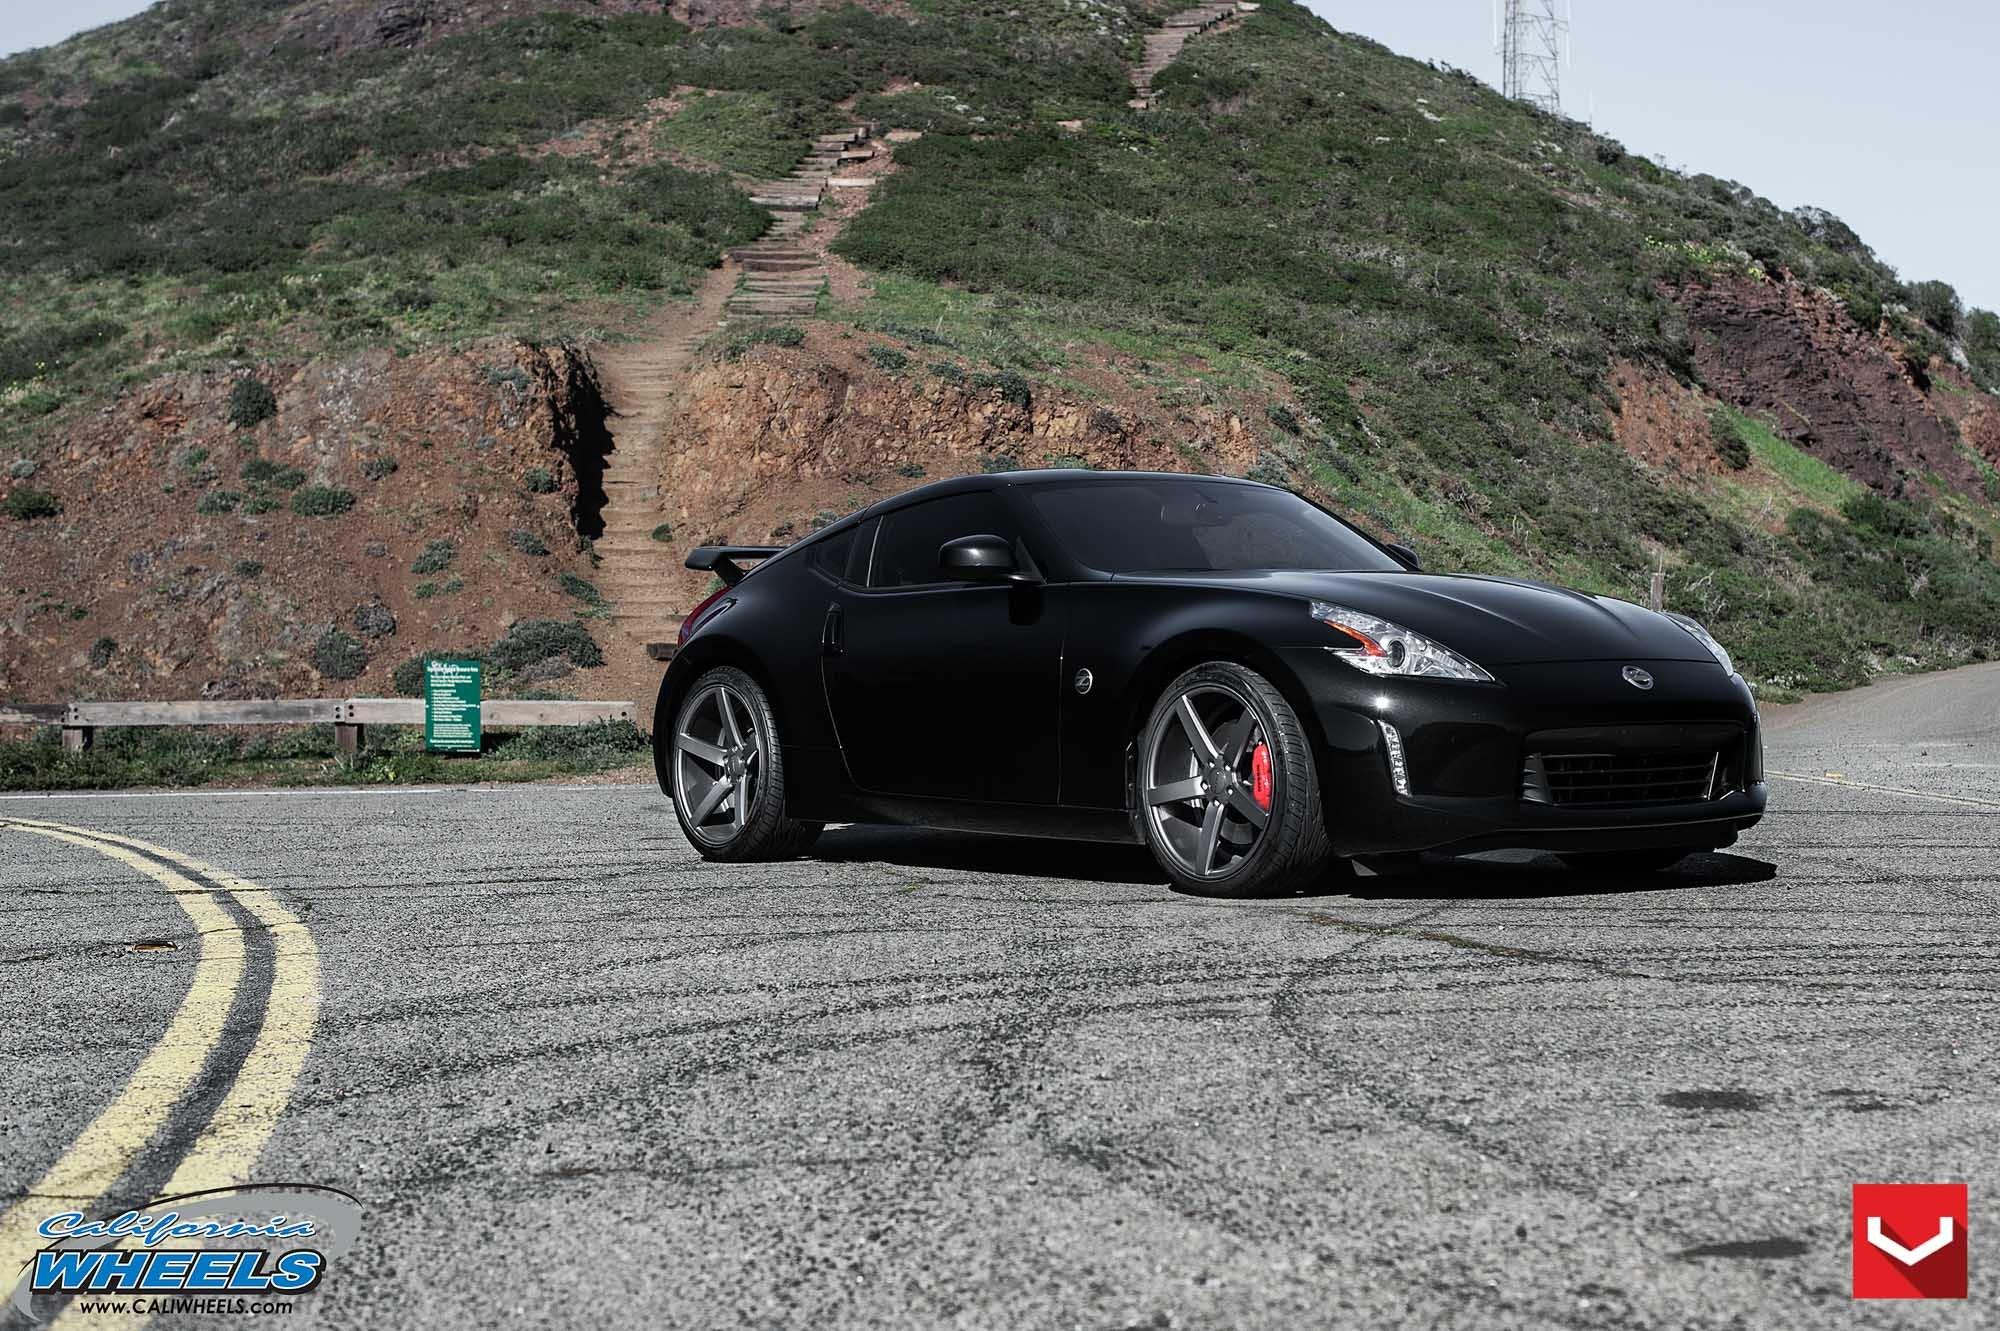 acing Black Nissan 370Z Customized to Amaze — CARiD.com Gallery